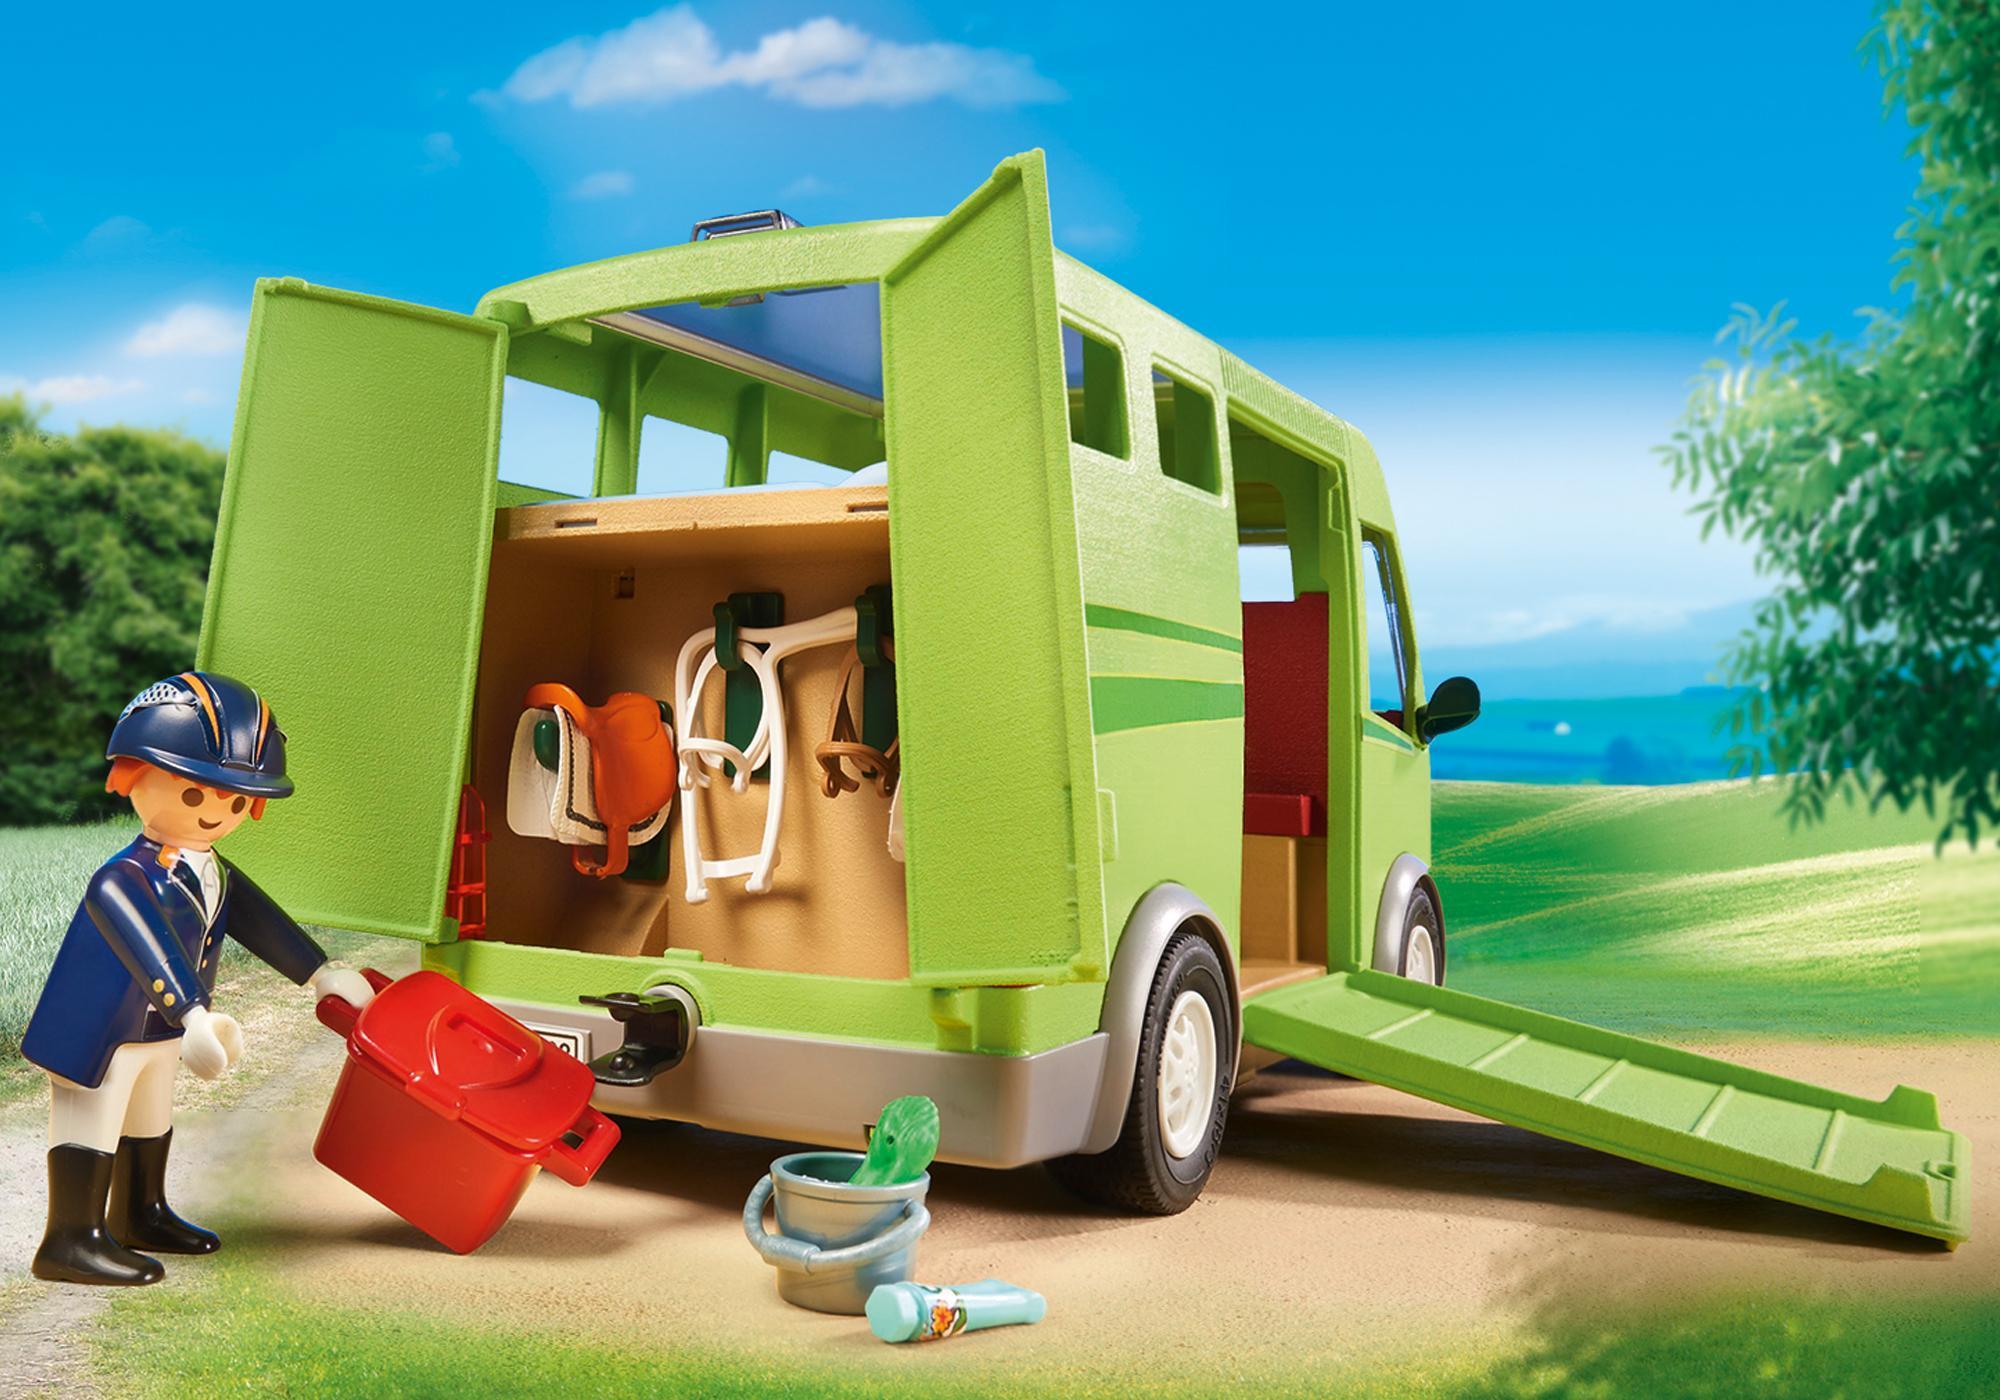 http://media.playmobil.com/i/playmobil/6928_product_extra2/Paardenvrachtwagen